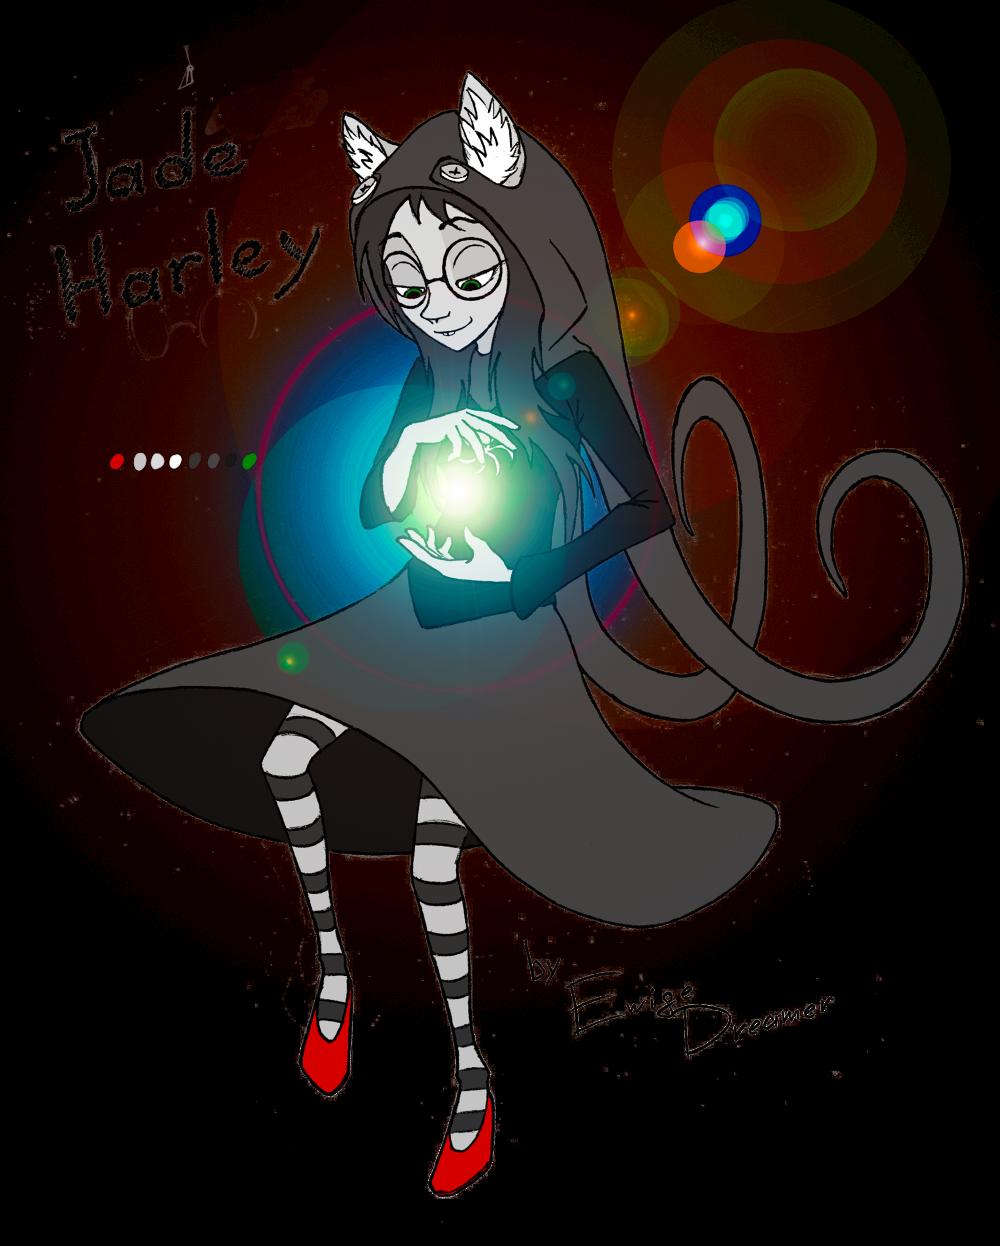 Jade Harley 'Dog-Tier'